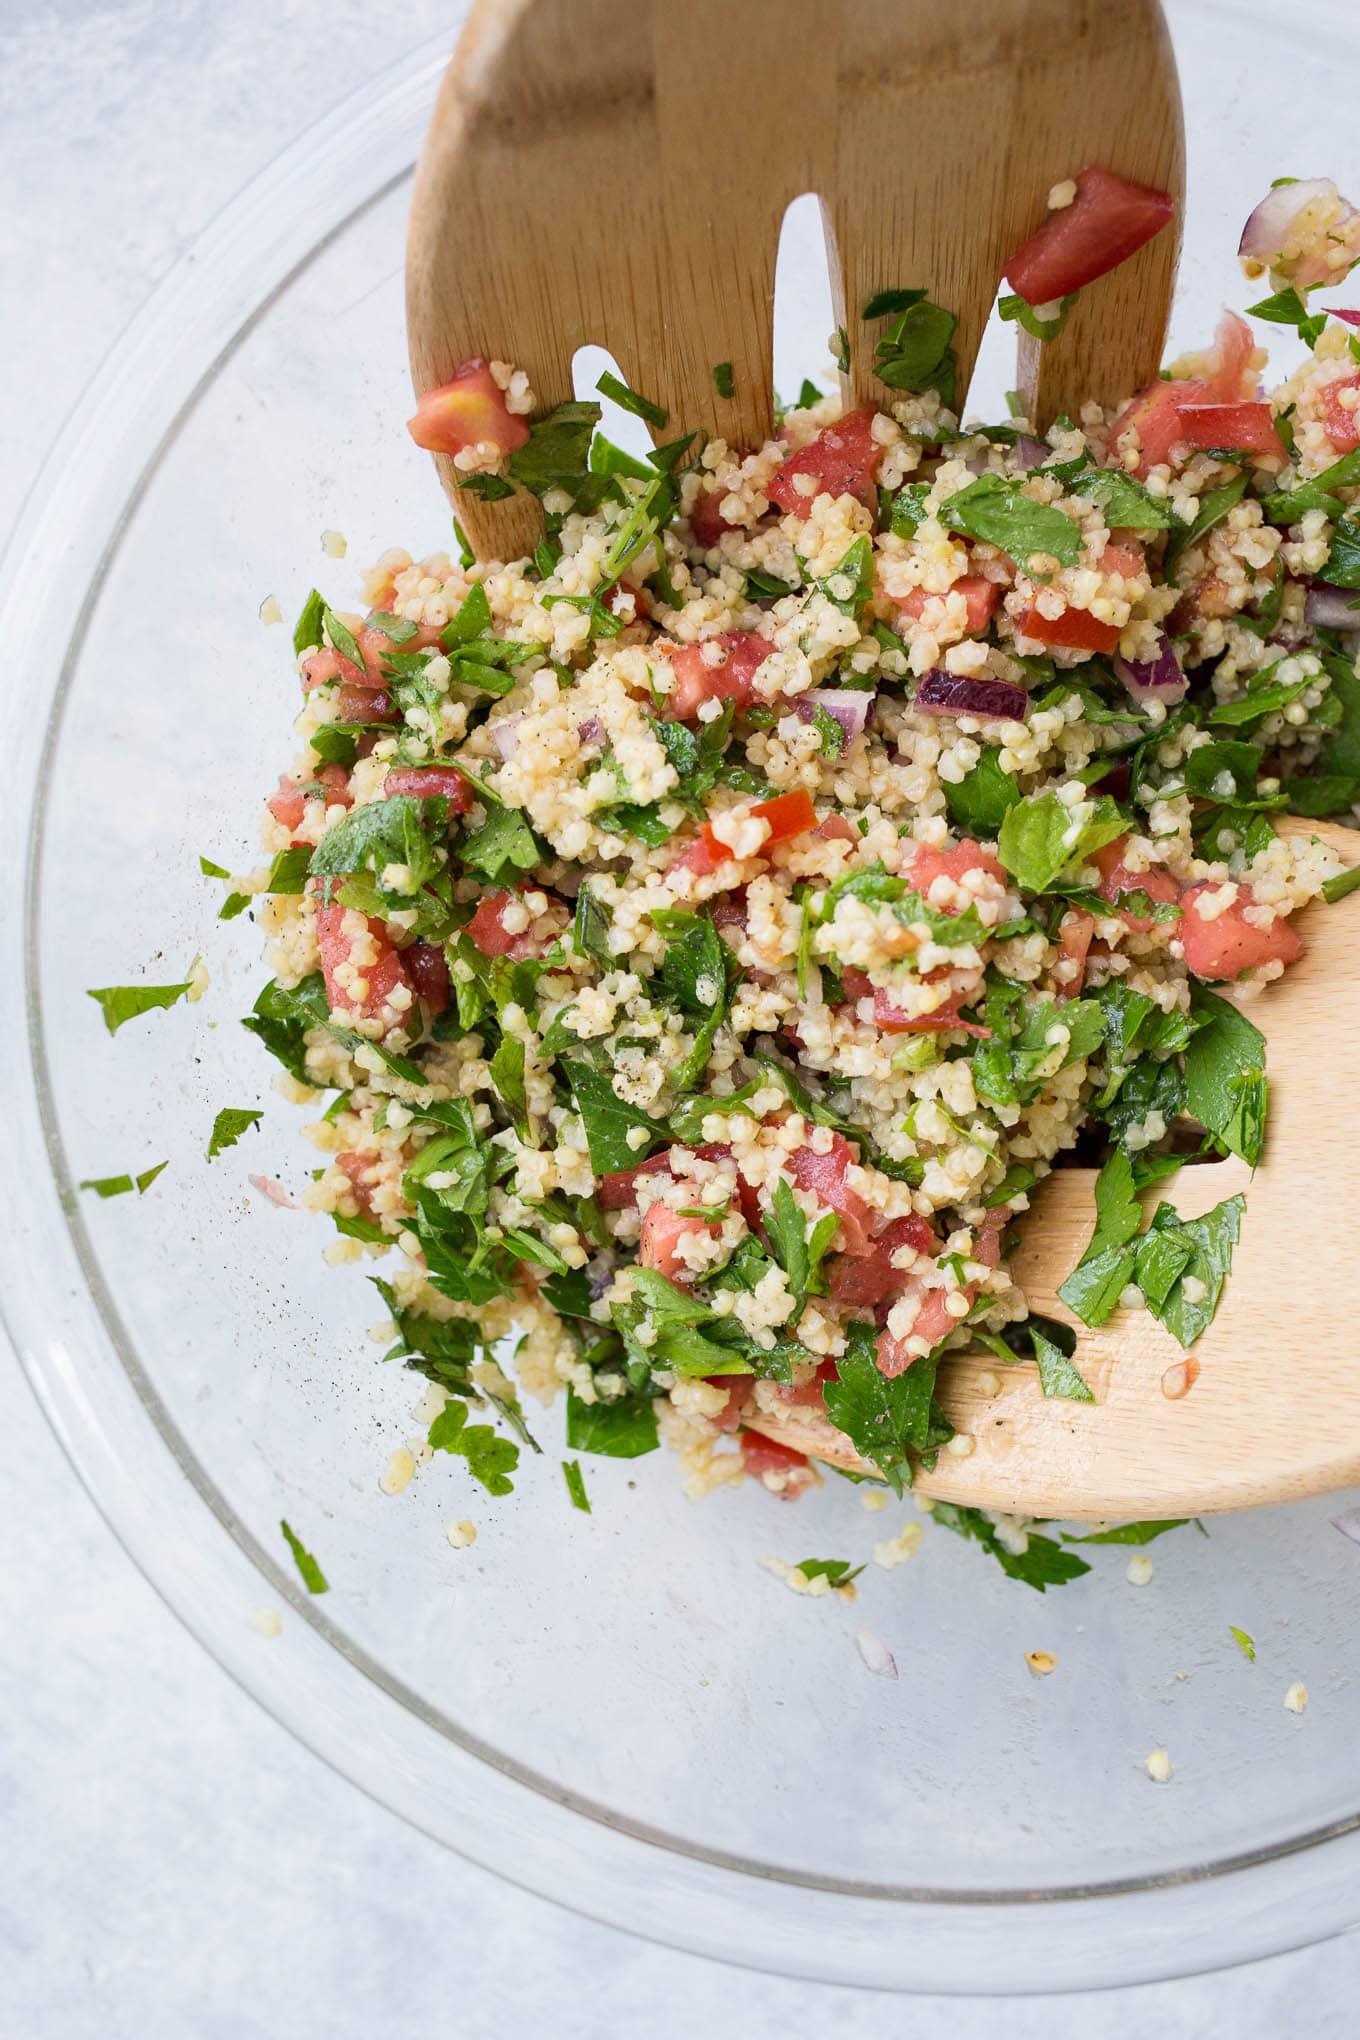 Millet Tabbouleh Salad (Gluten-Free, Vegan) | saltedplains.com